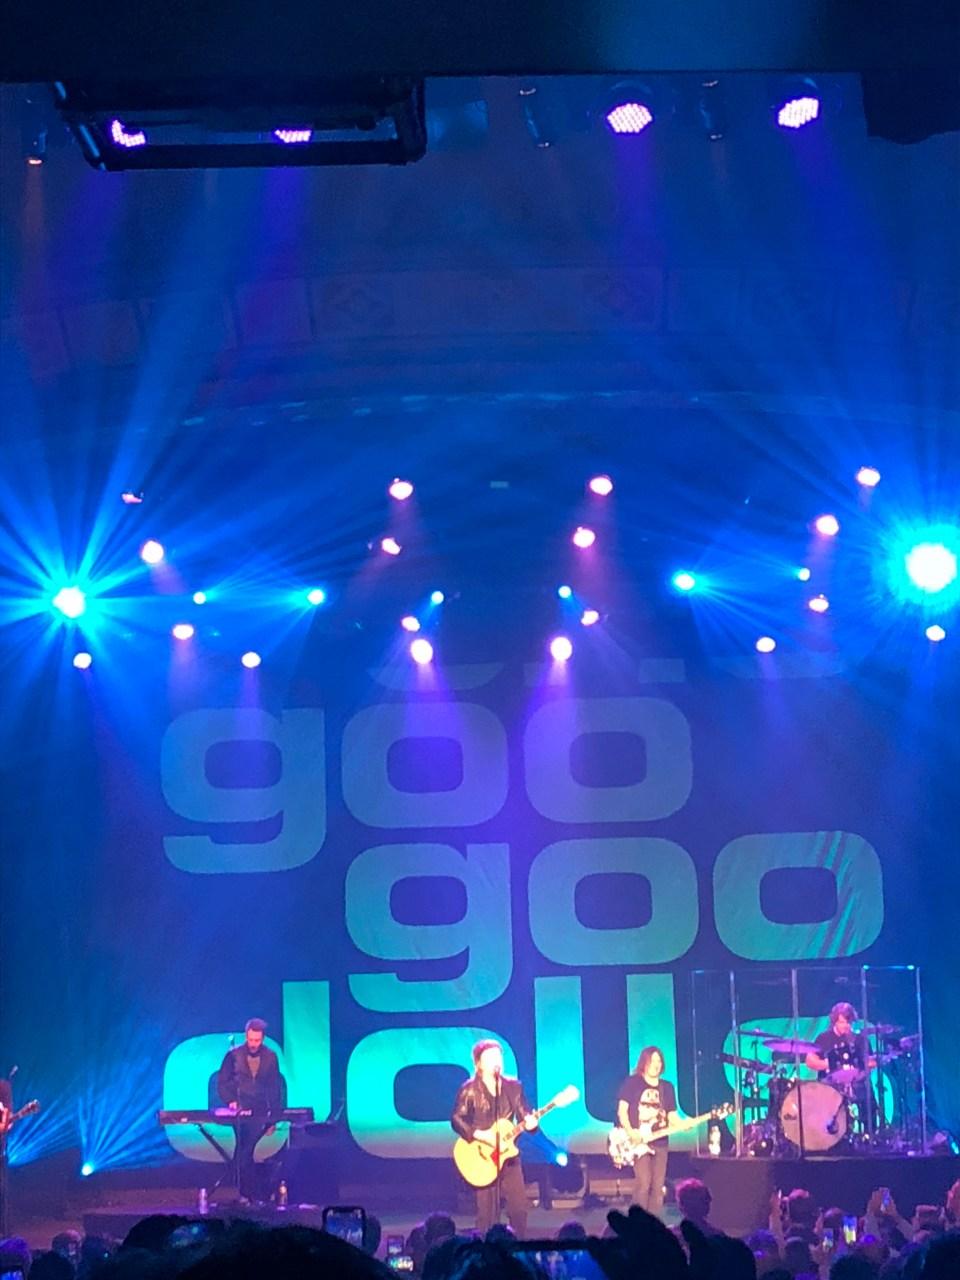 Goo Goo Dolls - Dizzy Up the Girl Anniversary 3